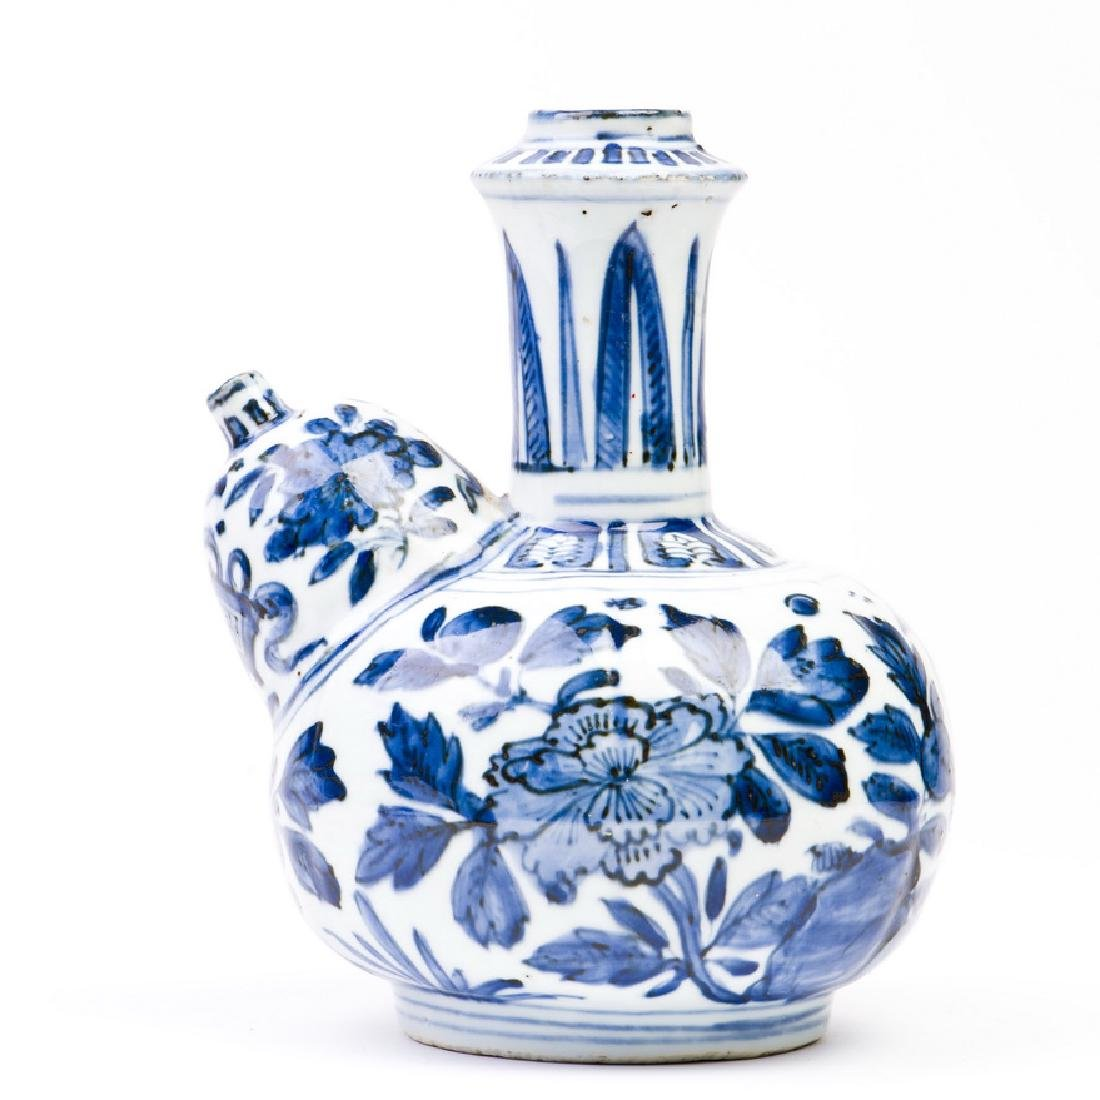 A Blue and White Peony Kendi